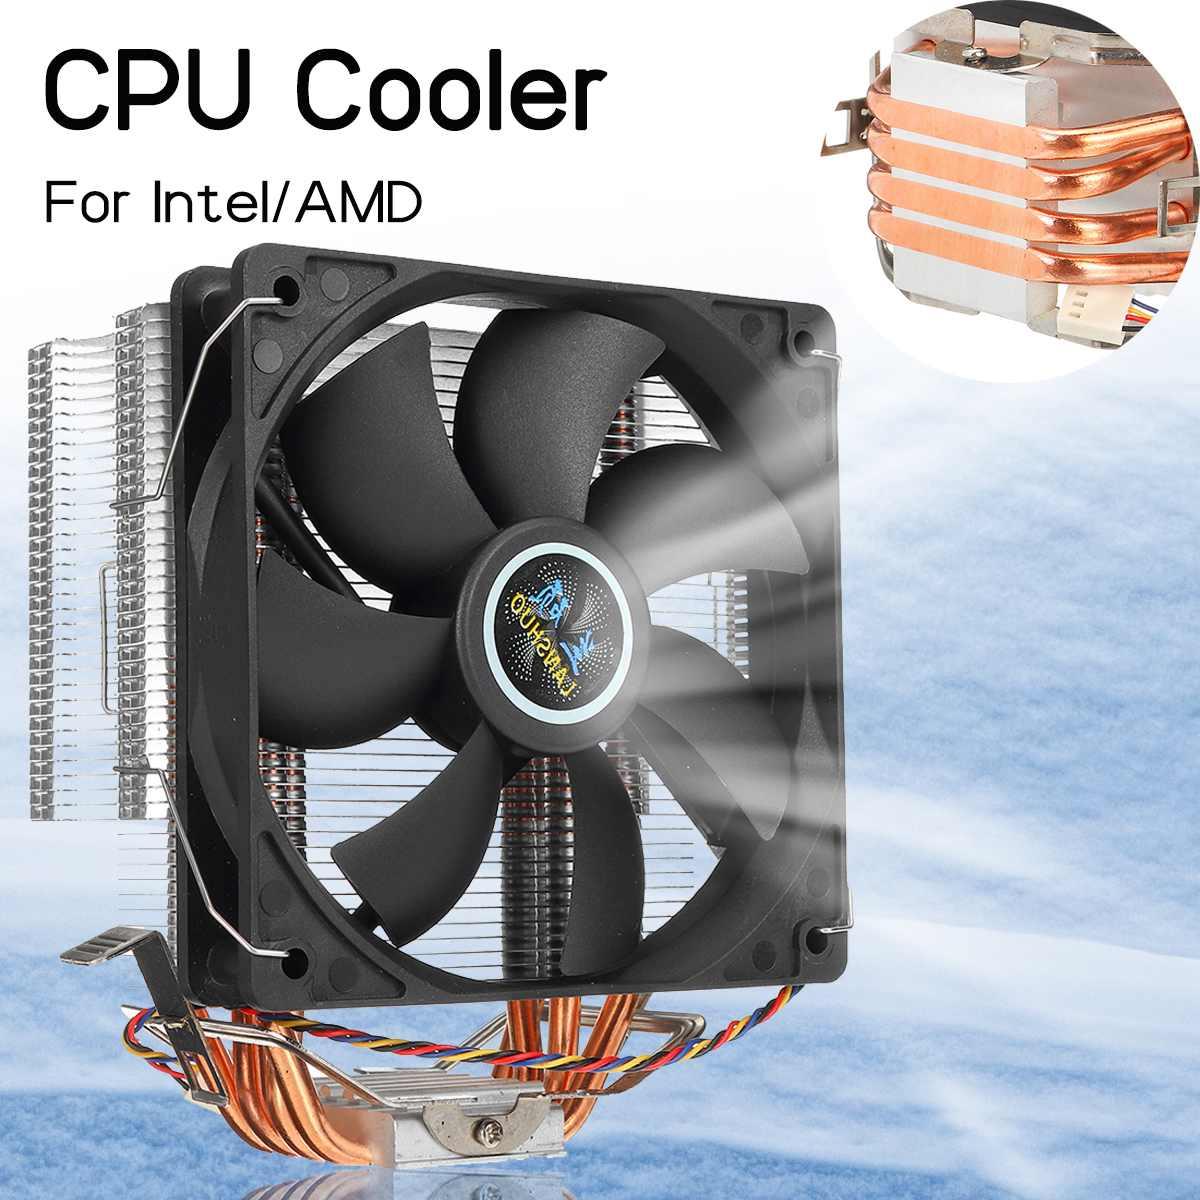 12cm 4 Heat Pipes CPU Cooler Aluminum 3Pin Cooling Fan Cooler Heatsink Radiator for LGA 1150/1151/1155/1156/1366/775 AMD AM3+